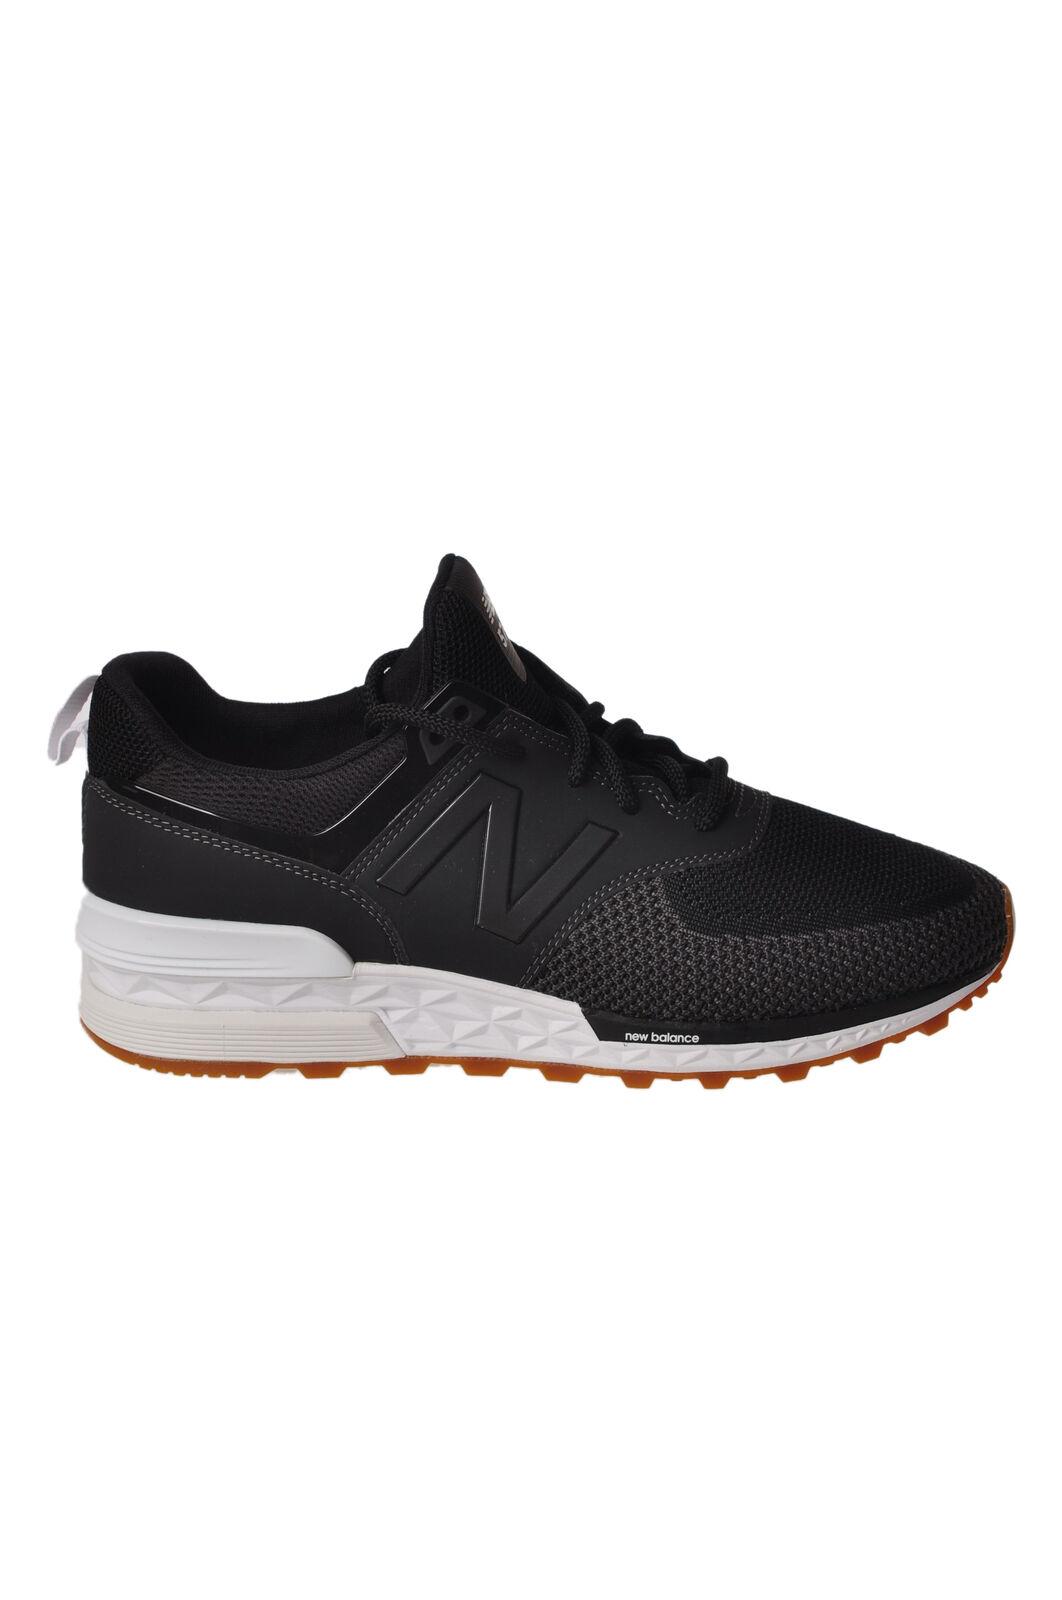 New Balance - zapatos-zapatos - Man - negro - 4845110C191813